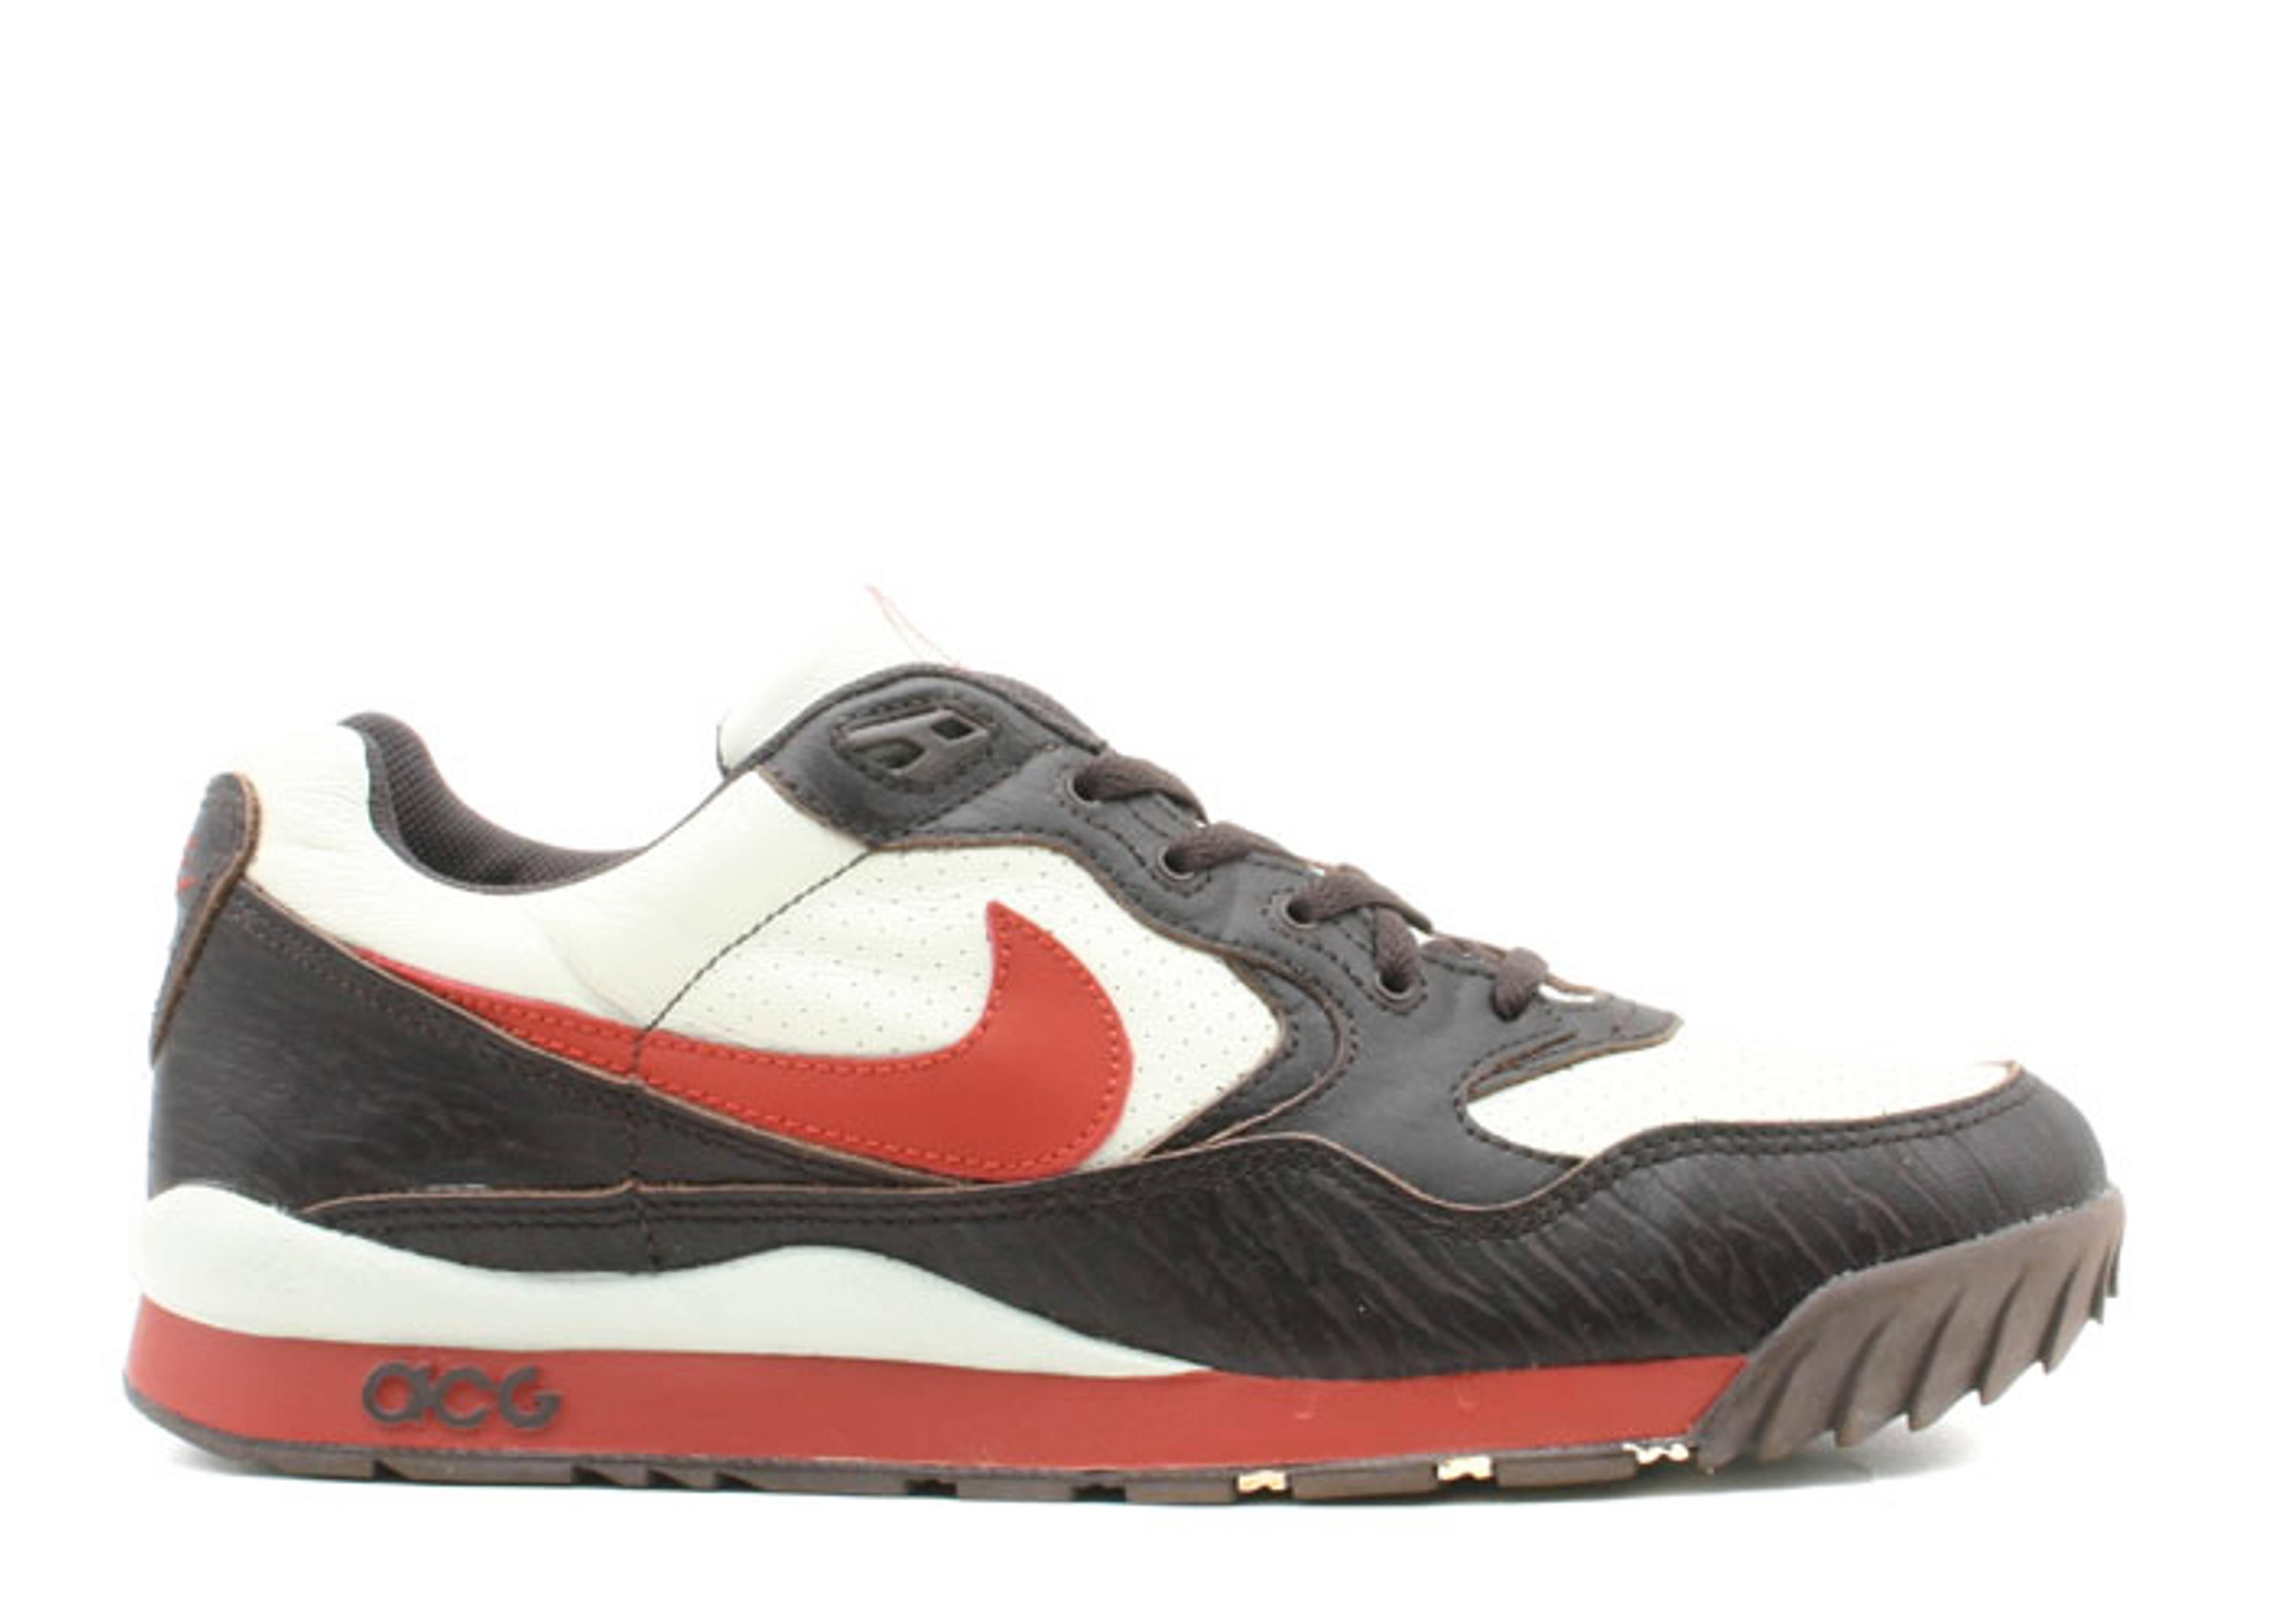 size 40 2263e 61dfa Air Wildwood Acg Premium - Nike - 306682 261 - baroque brn dragon red-lt  bone   Flight Club